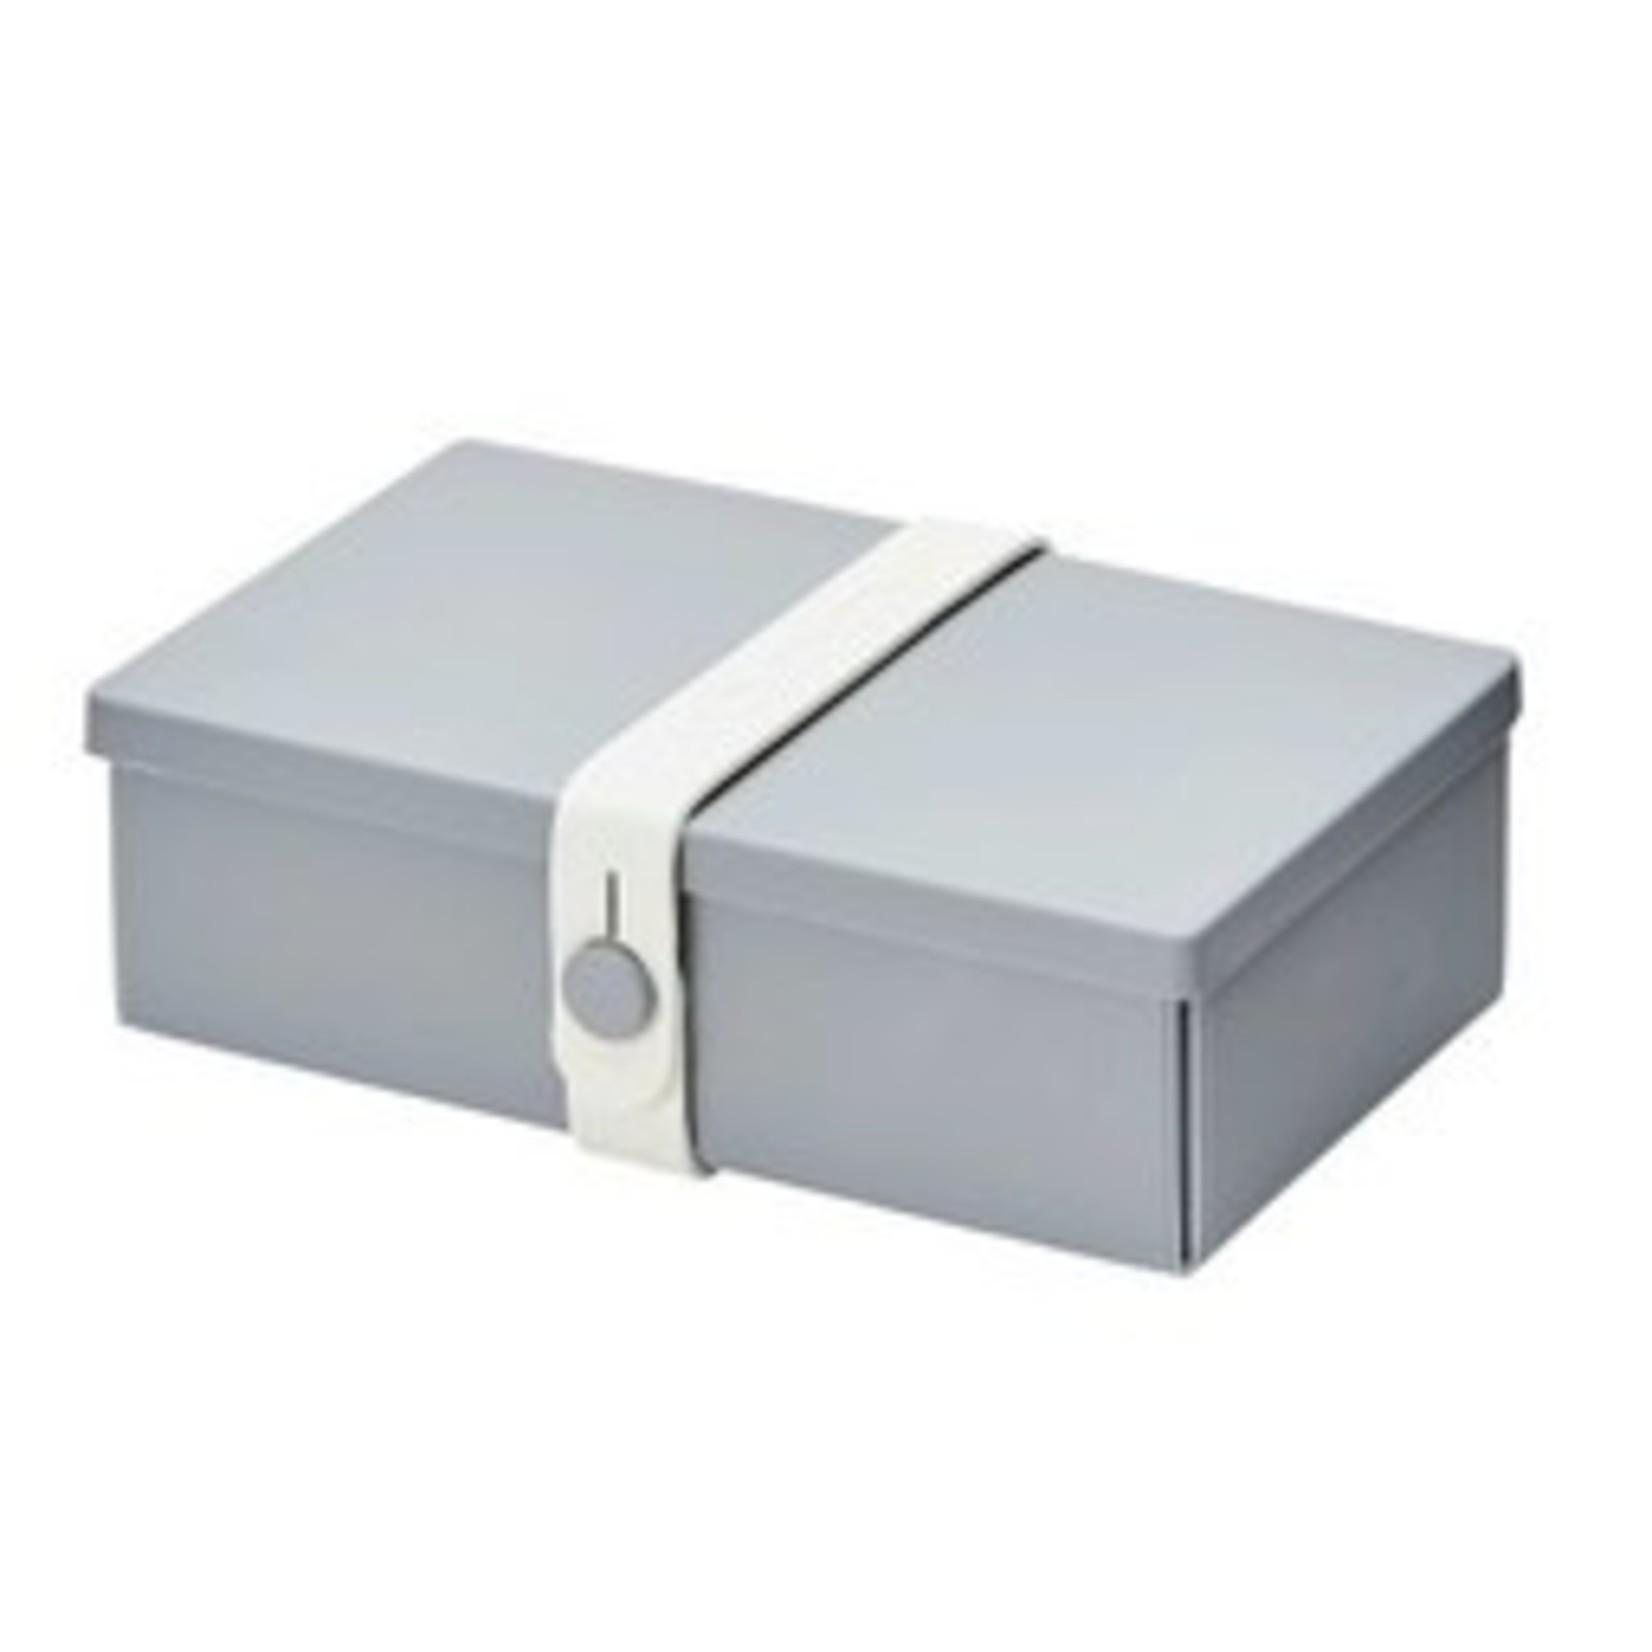 Uhmmbox Nr.01 Light Grey